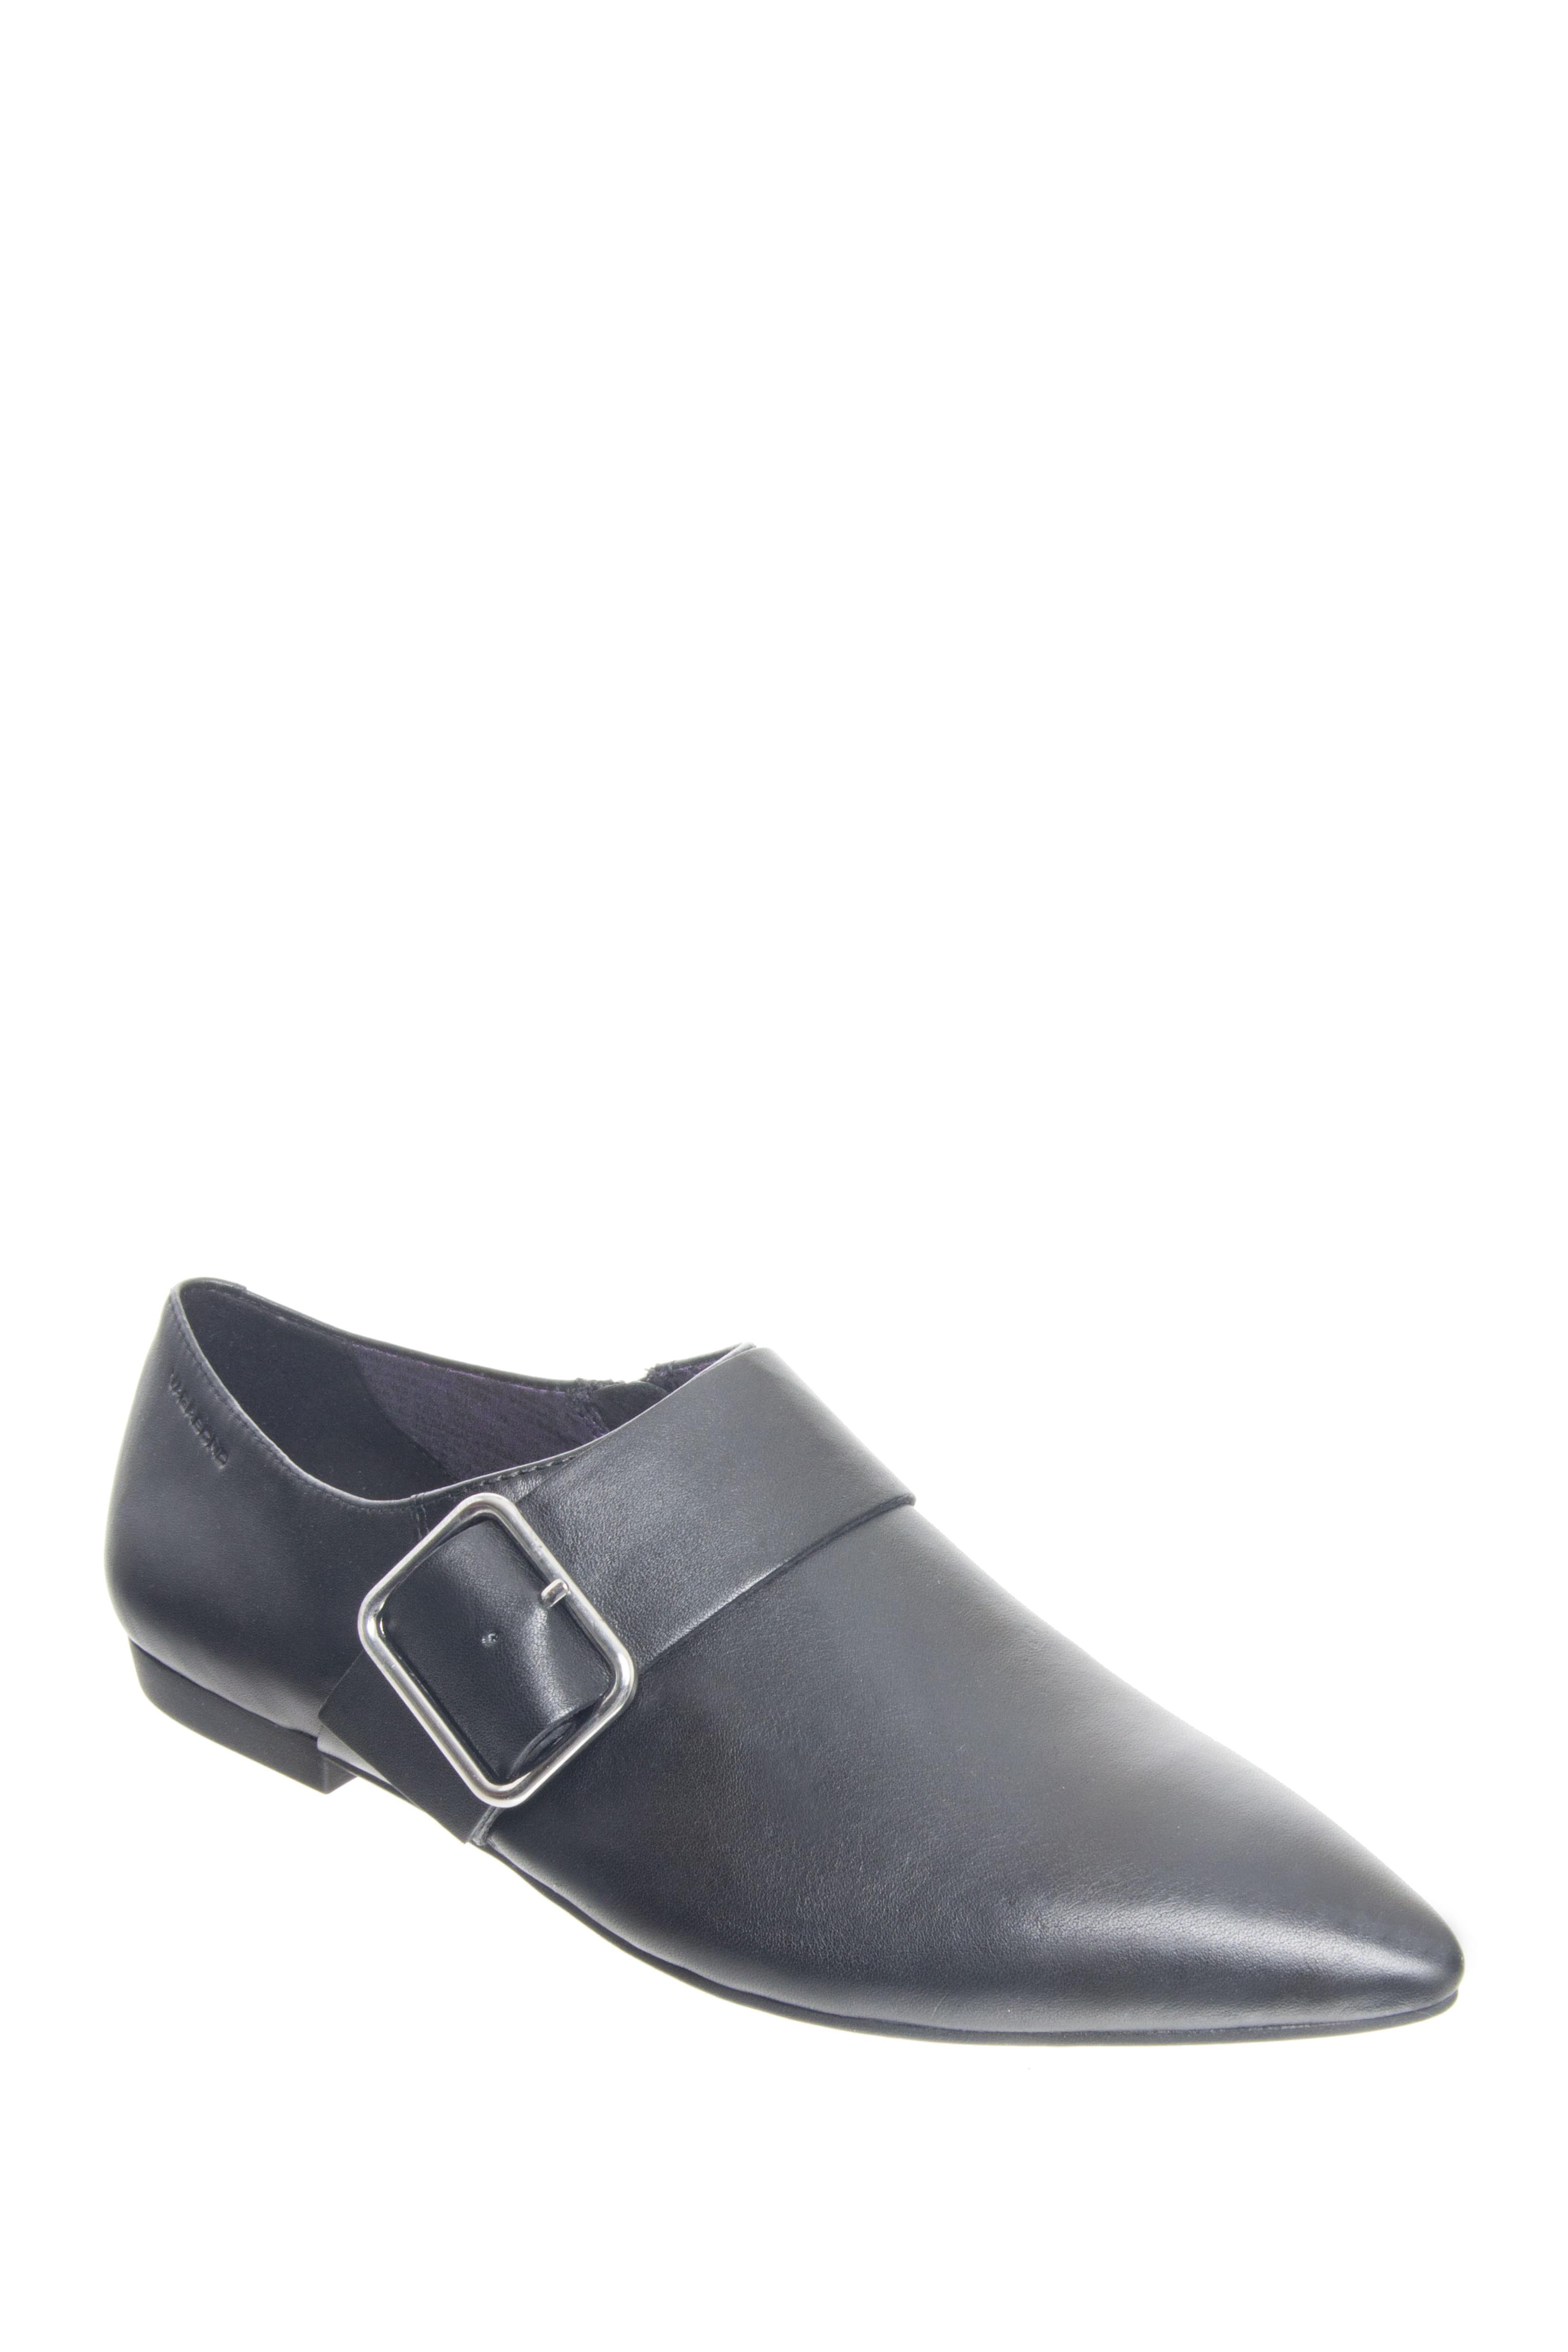 Vagabond Katlin Leather Buckle Ankle Booties - Black